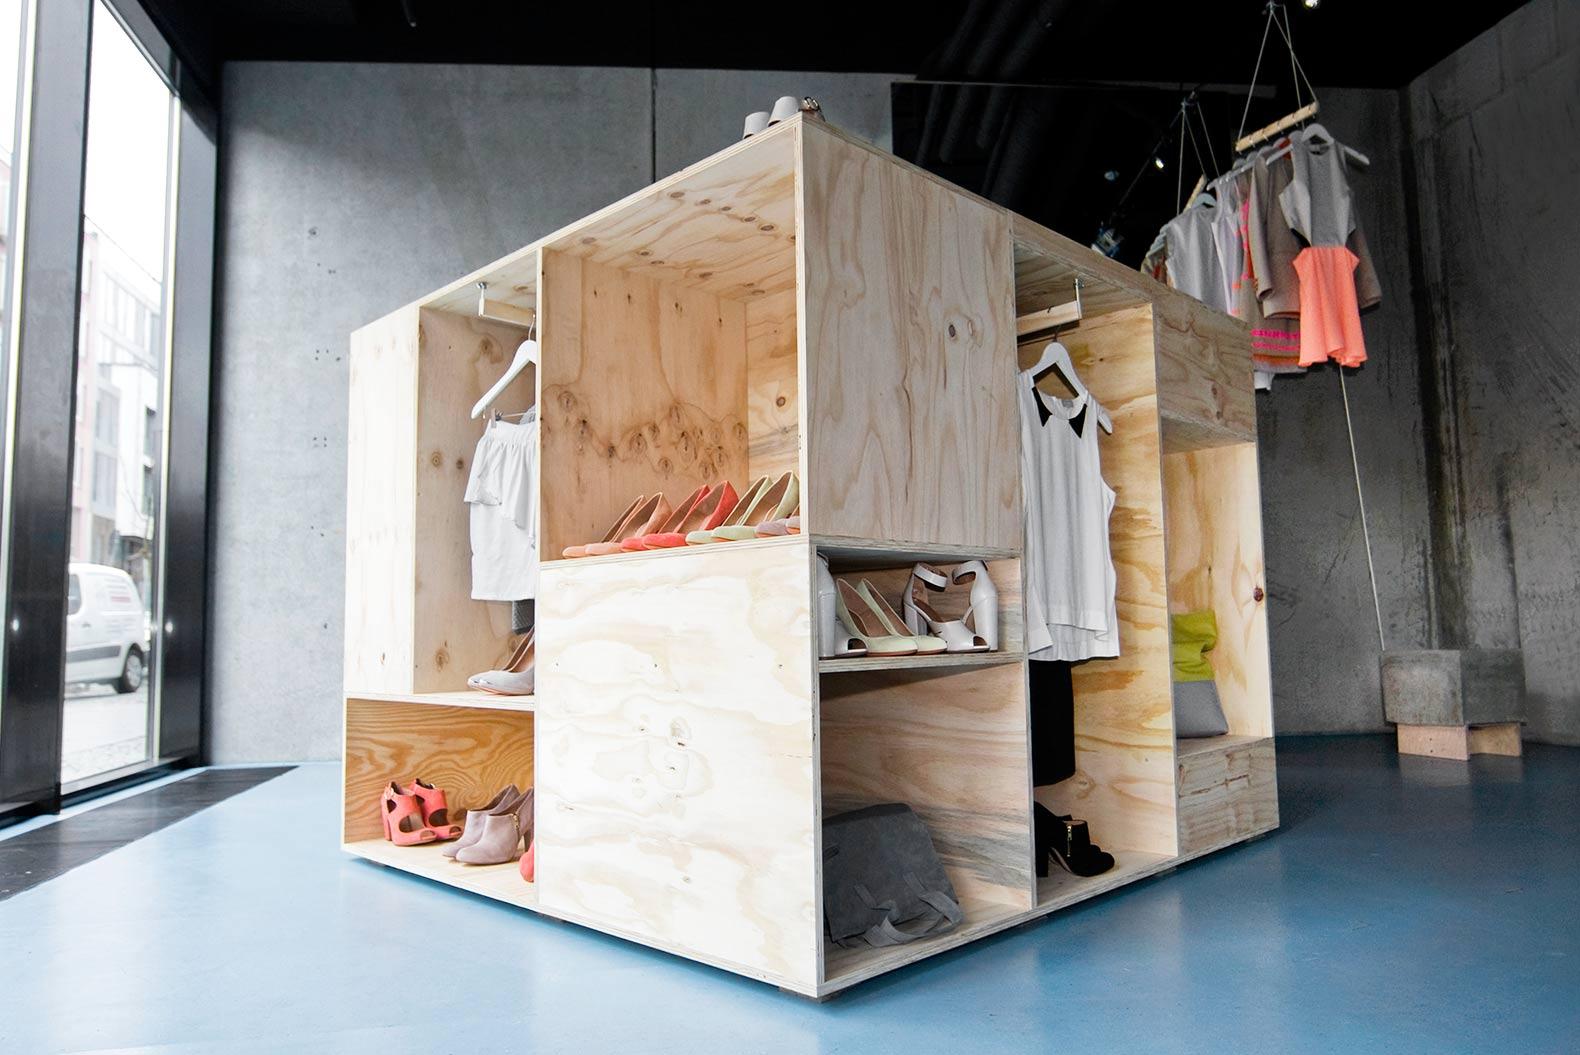 Sigurd-Larsen-wooden-wardrobes-pop-up-berlin-store-1.jpg